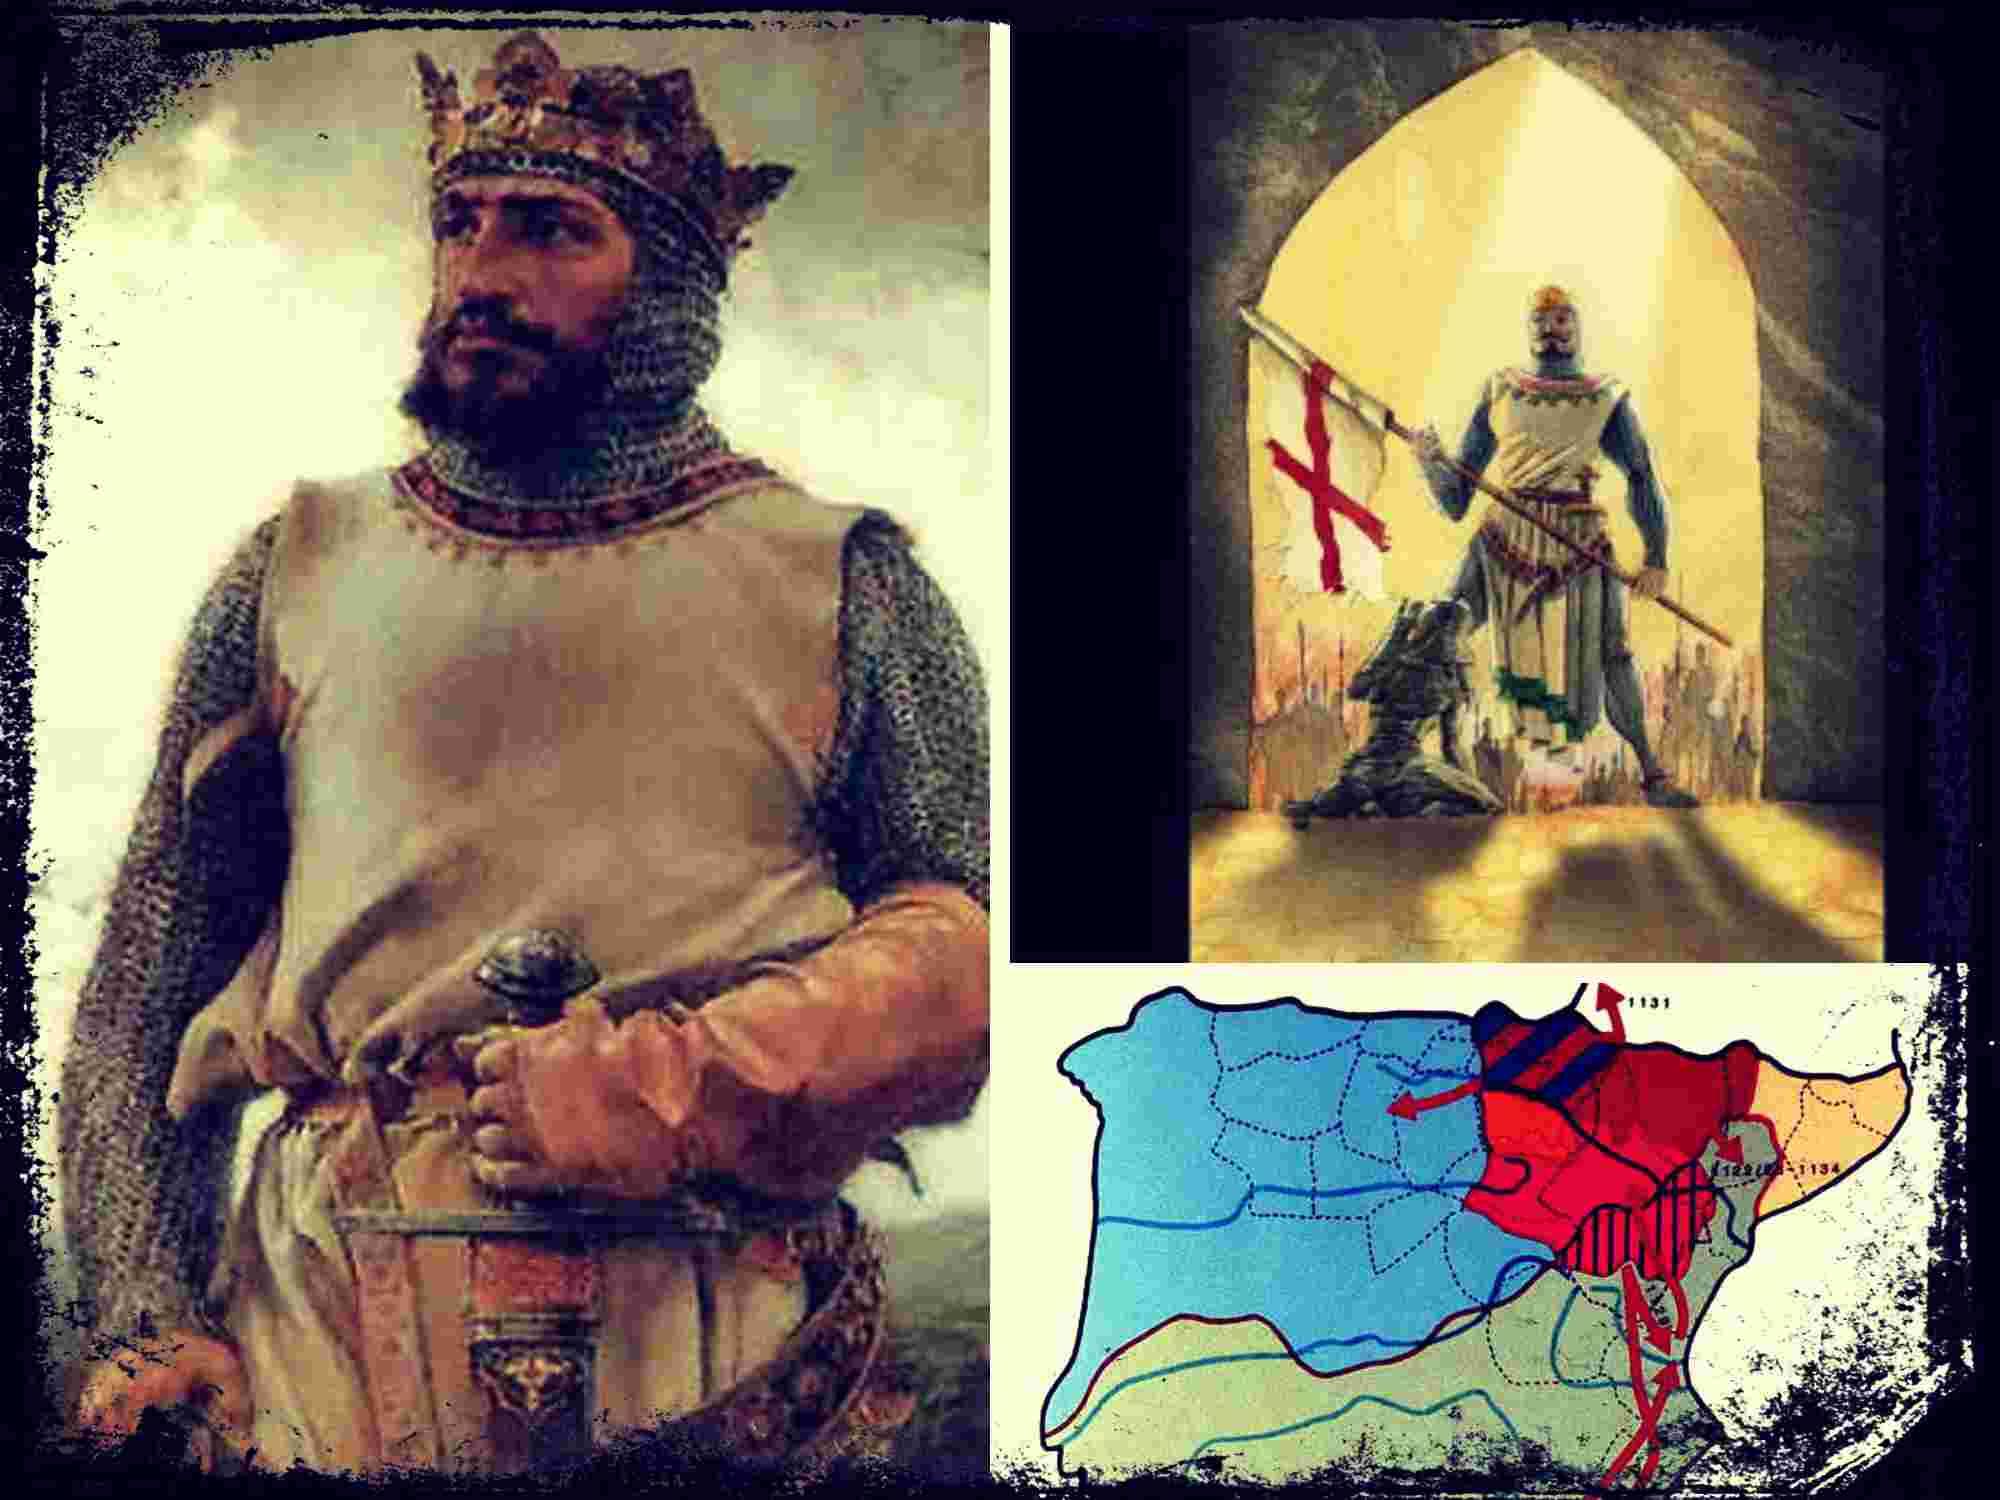 Alfonso I de Aragón y I de Pamplona, el Batallador